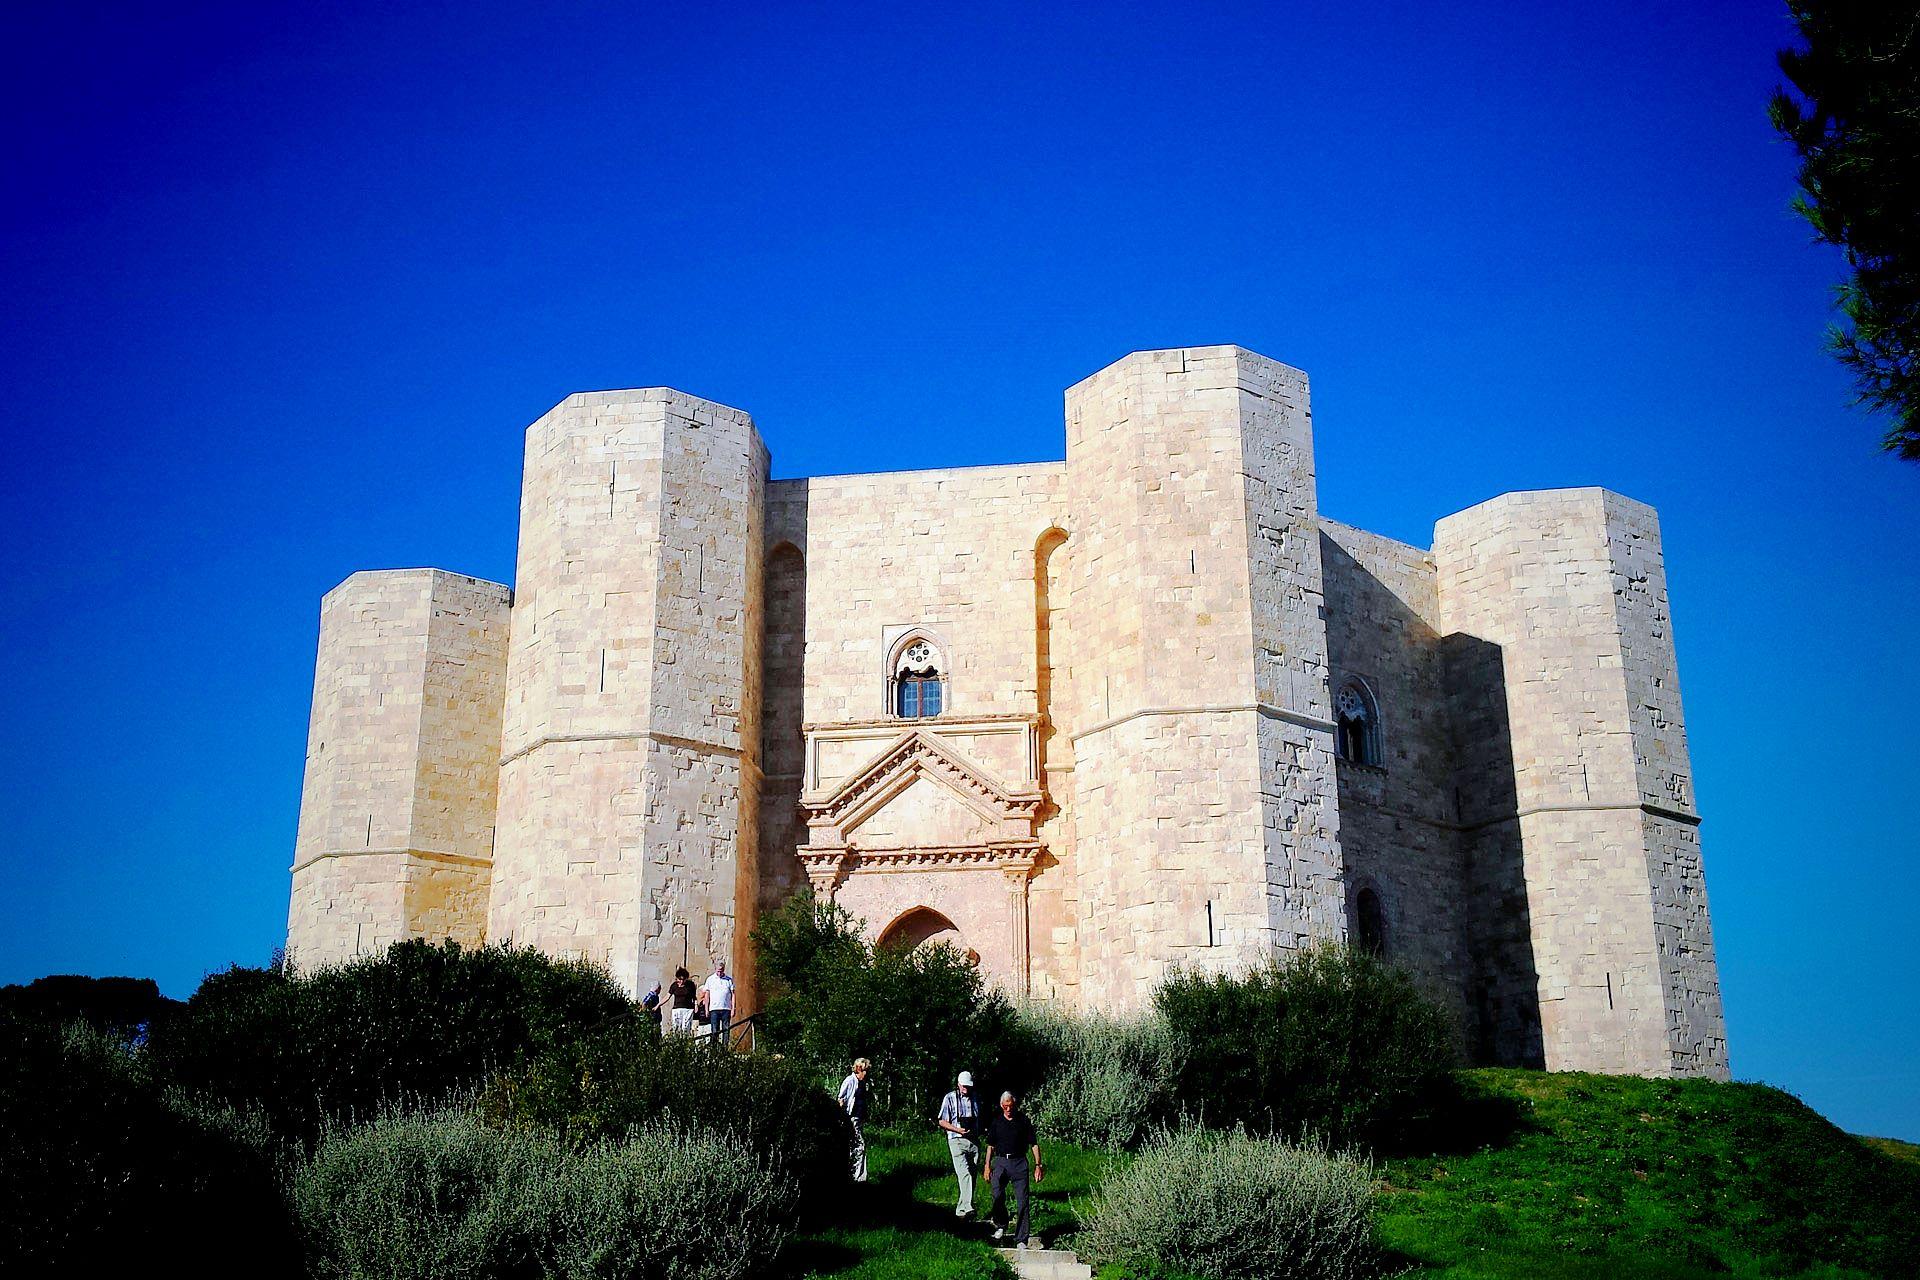 apulia-slow-travel-castel del monte-unesco-bat-federico II-friedrich II-frederick II-medioevo-mittelalter-achteck-ottagono-octagon-svevia-hohenstaufer-apulien-puglia-weltkulturerbe-limestone